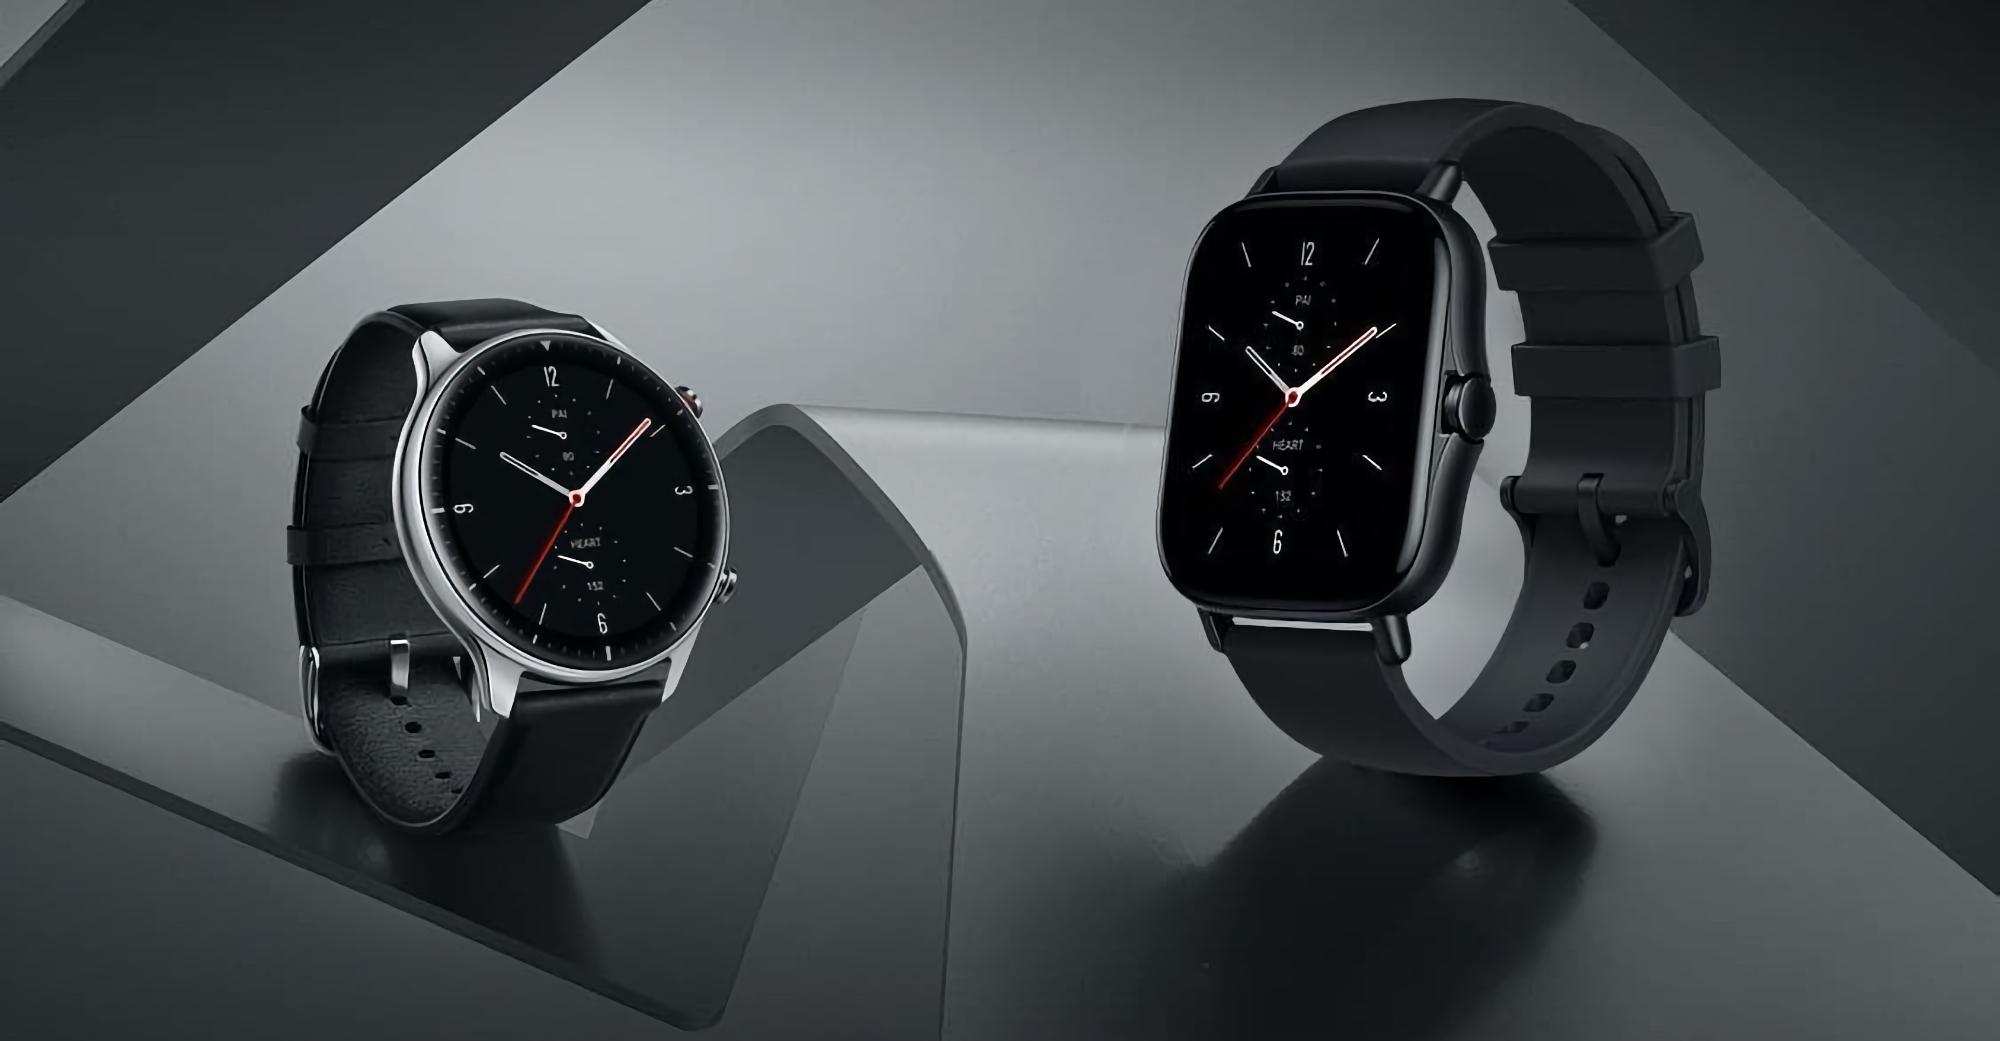 Amazfit GTR 2e и Amazfit GTS 2e вышли за пределами Китая: альтернатива Apple Watch за $139